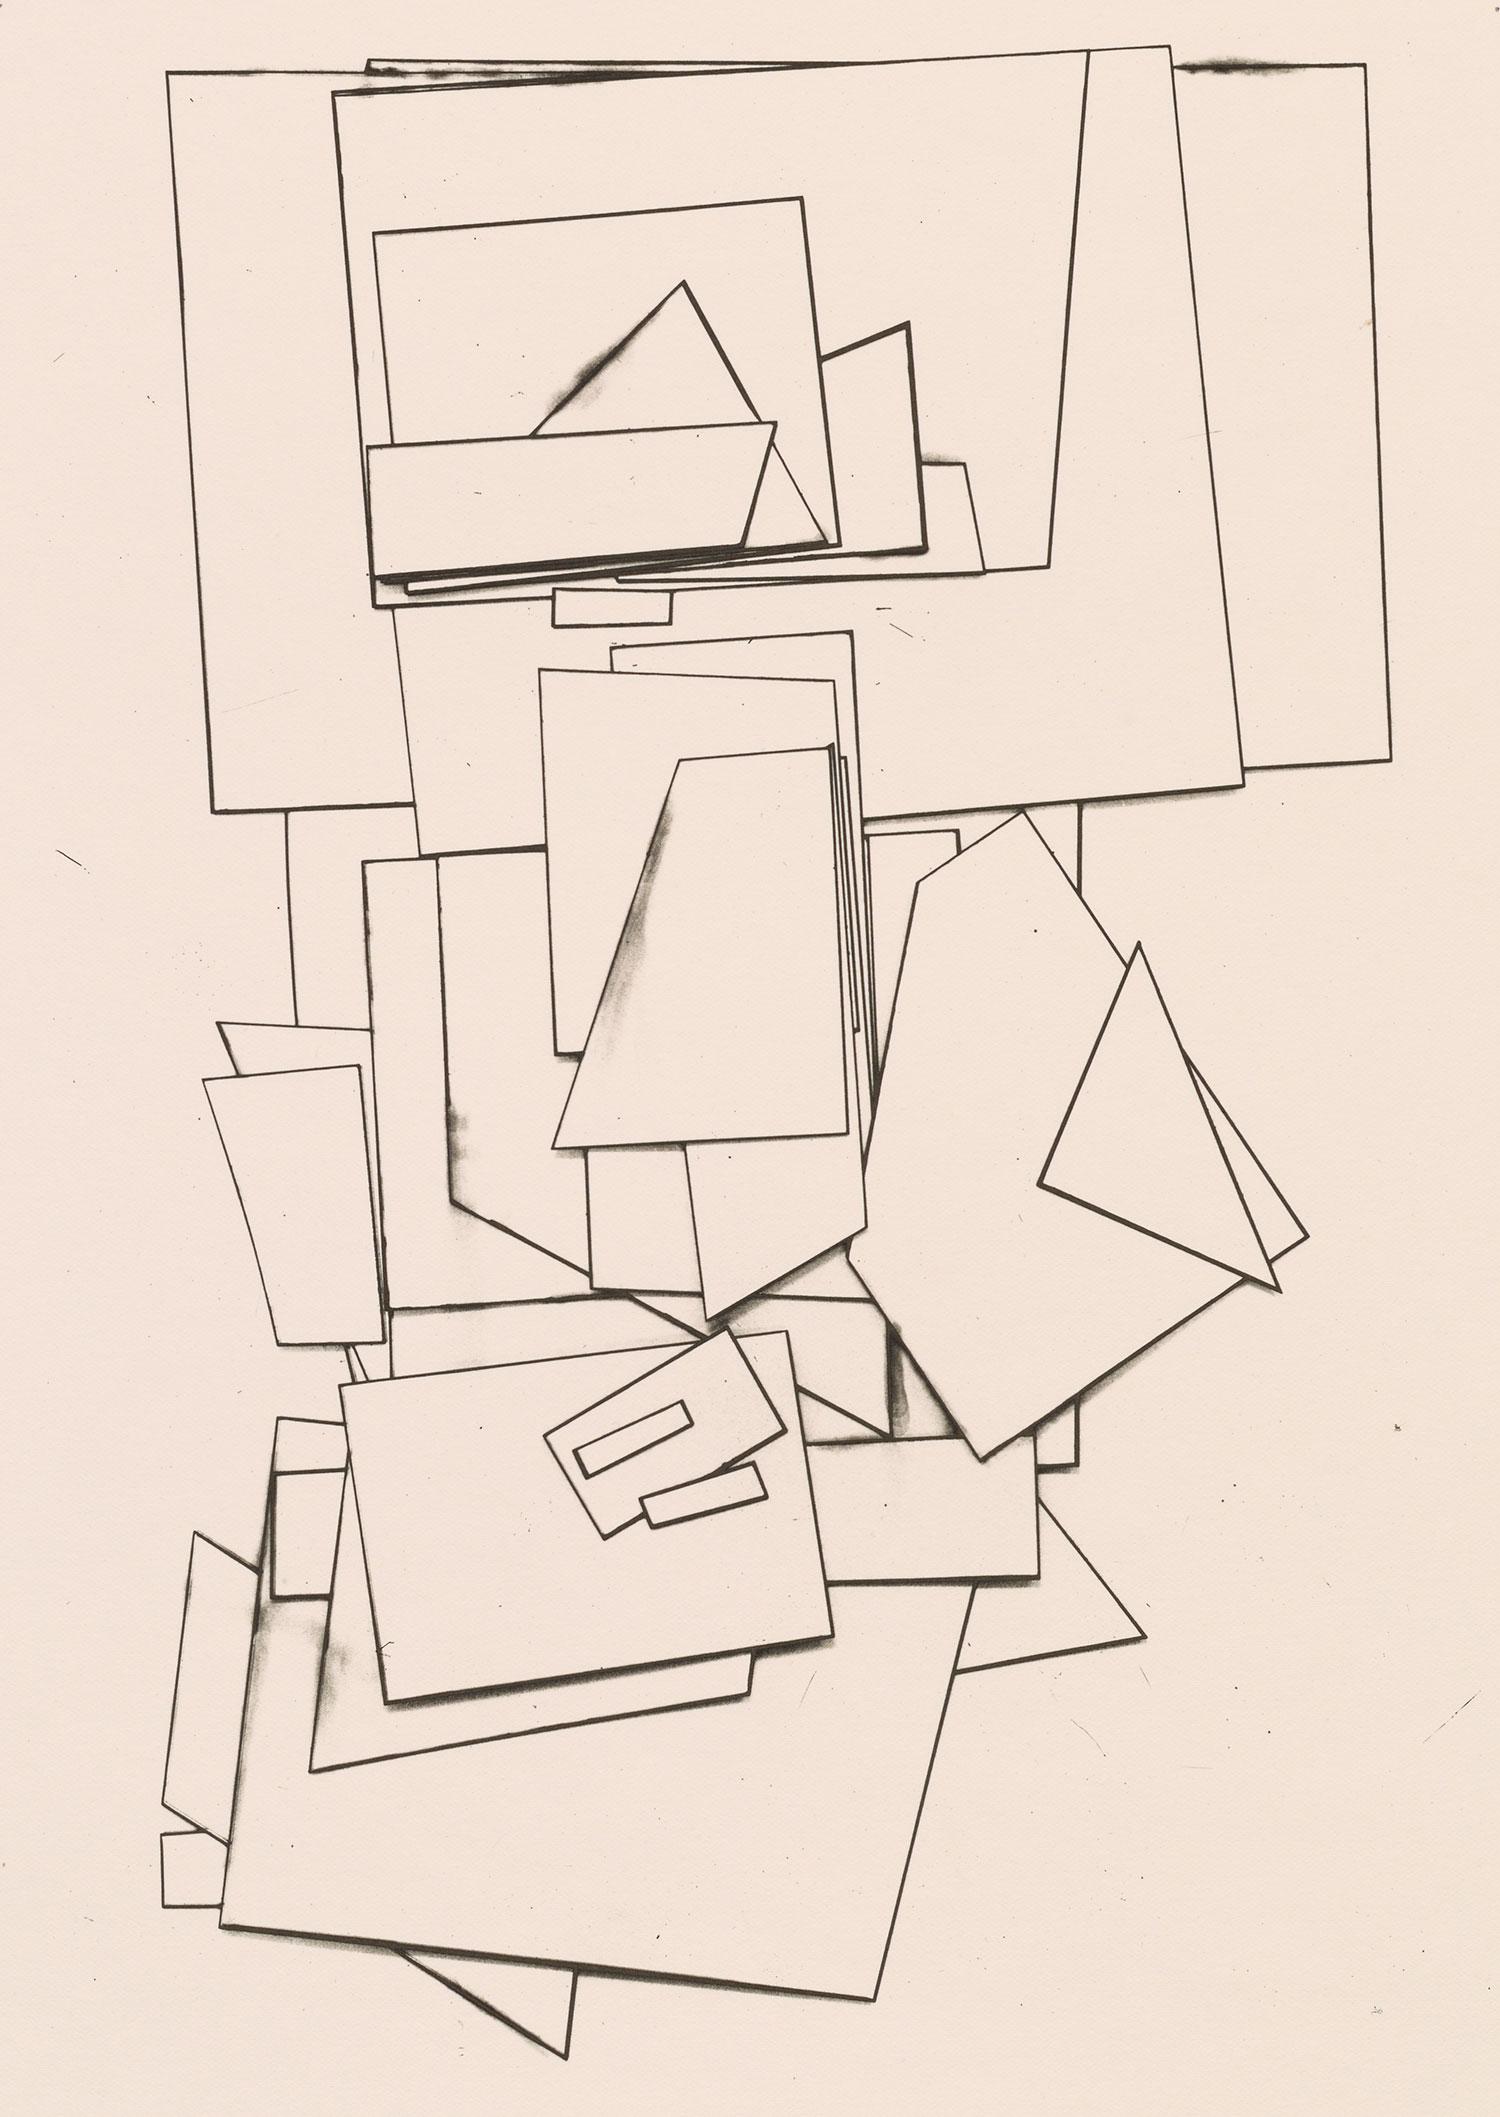 Irving Penn,  Cards 2 , New York, 1966. Platinum-palladium print. © The Irving Penn Foundation